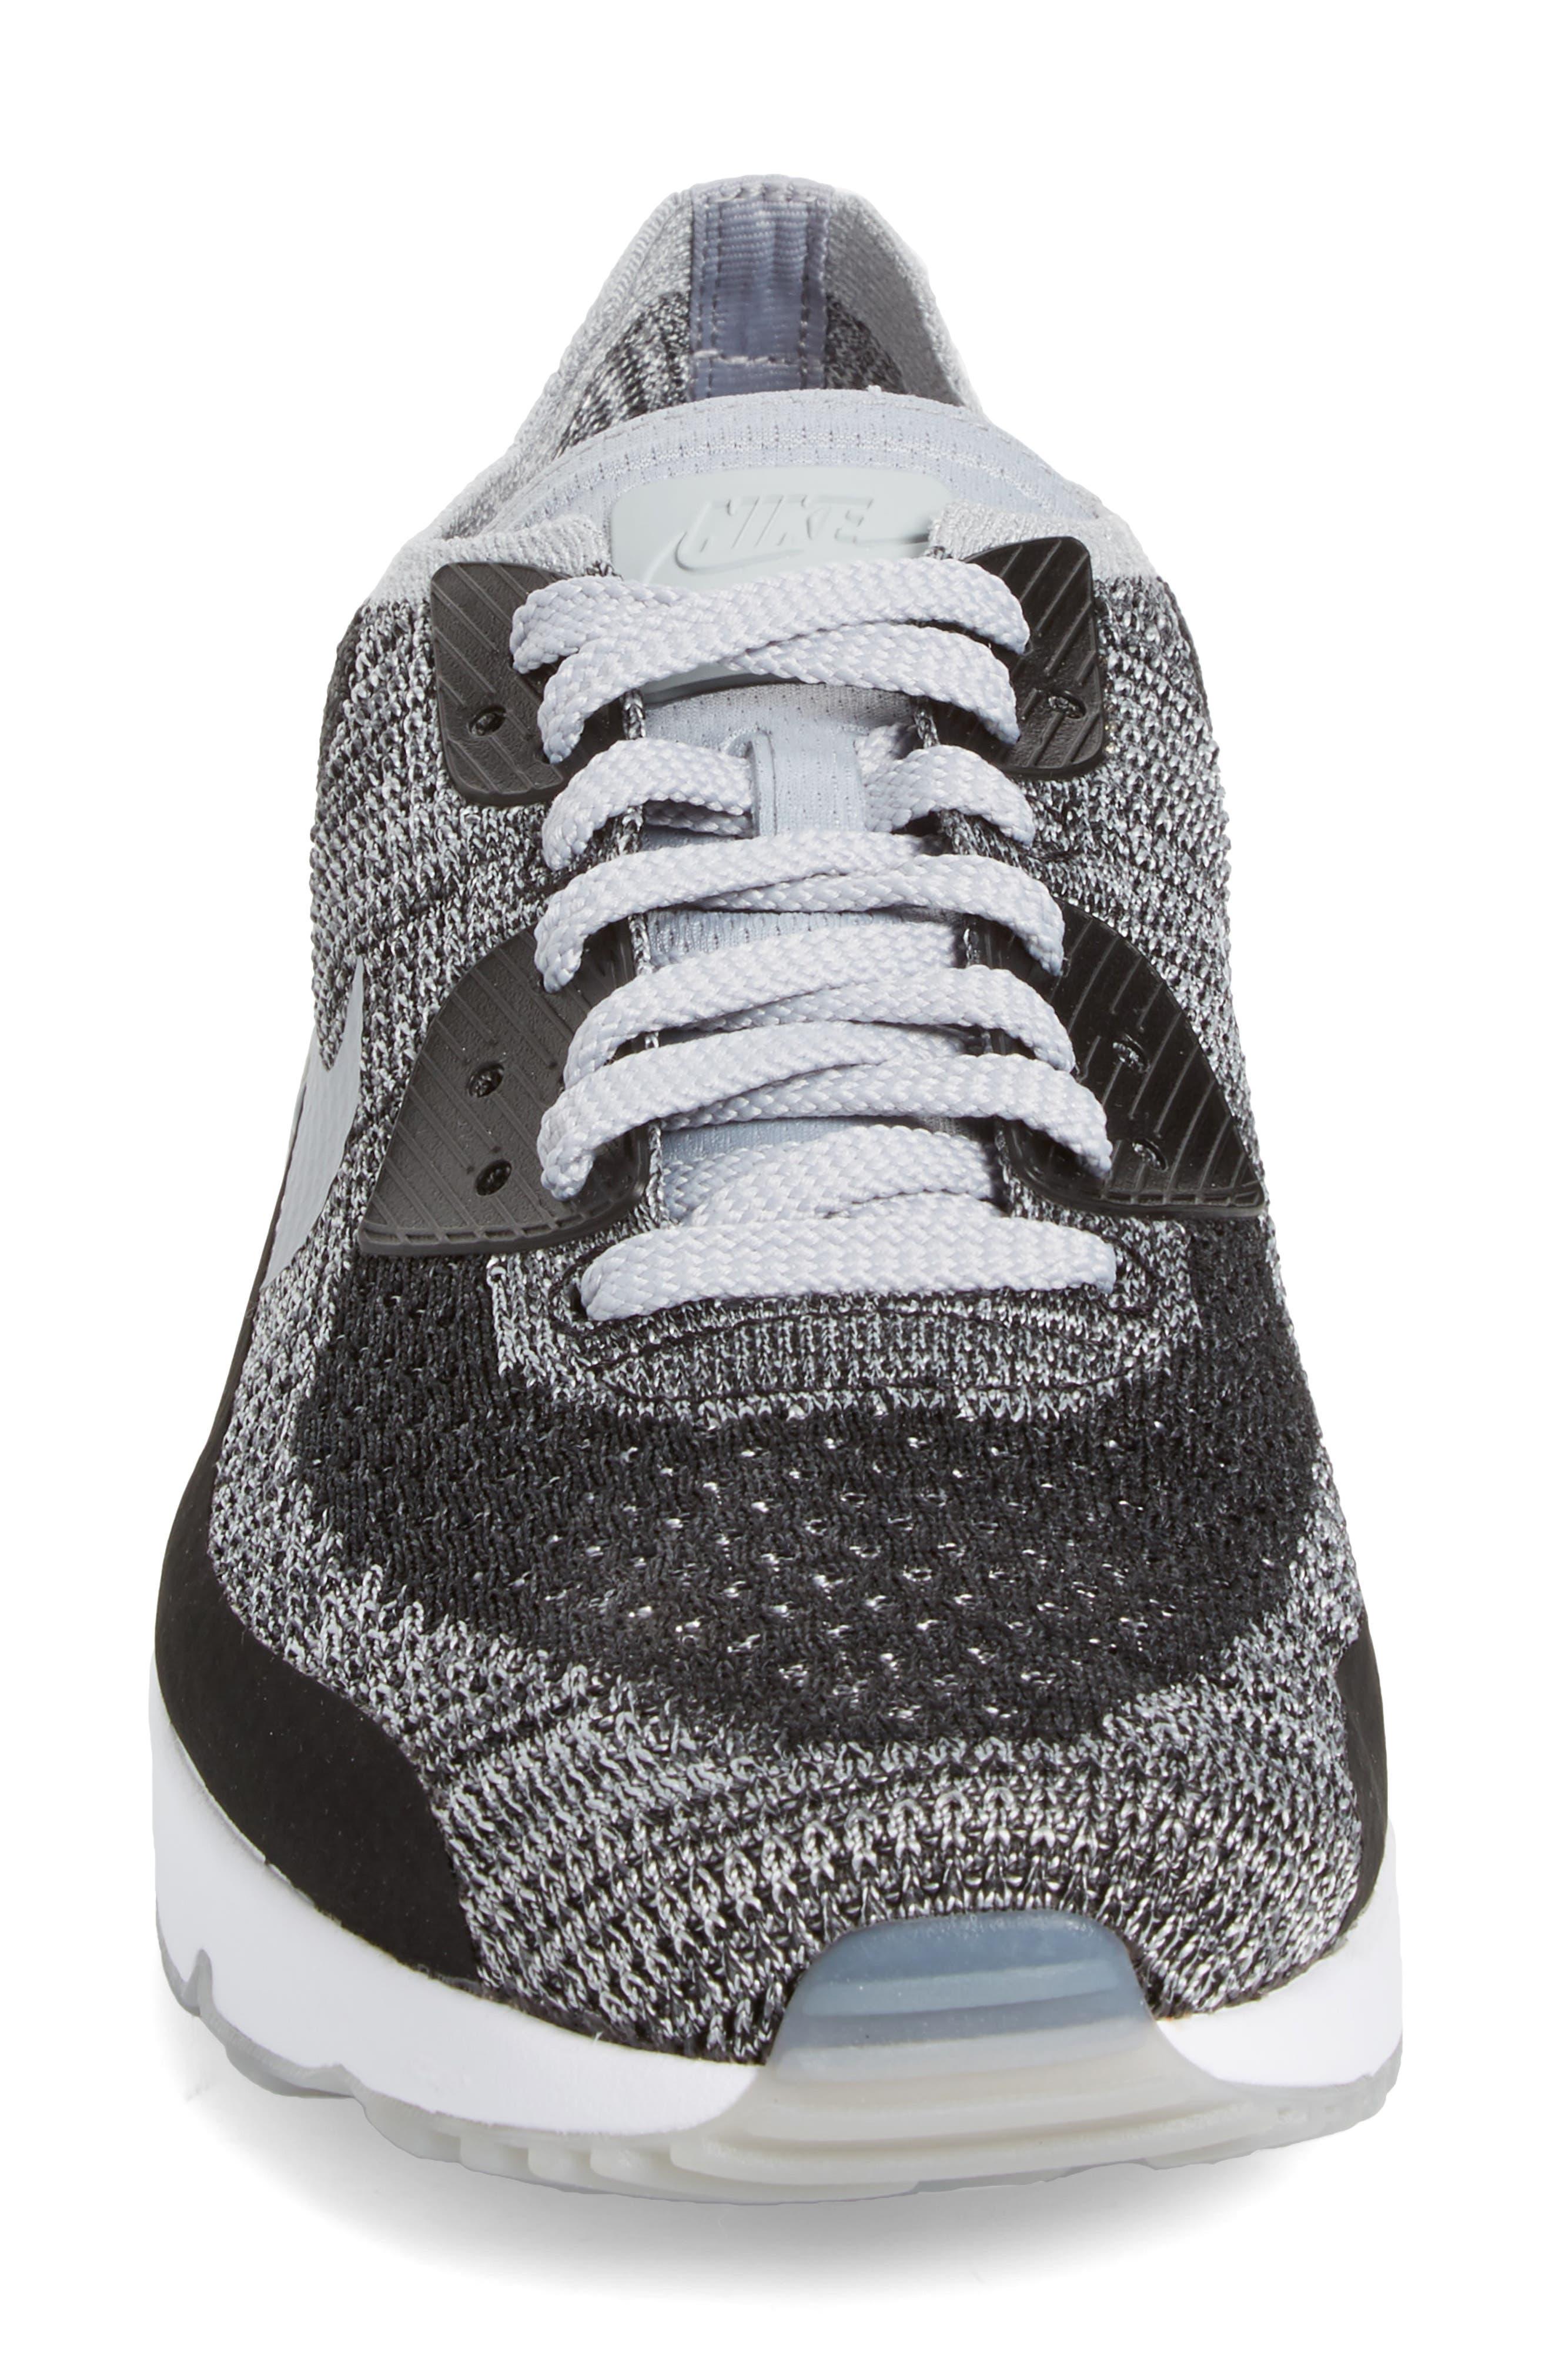 Air Max 90 Ultra 2.0 Flyknit Sneaker,                             Alternate thumbnail 4, color,                             005